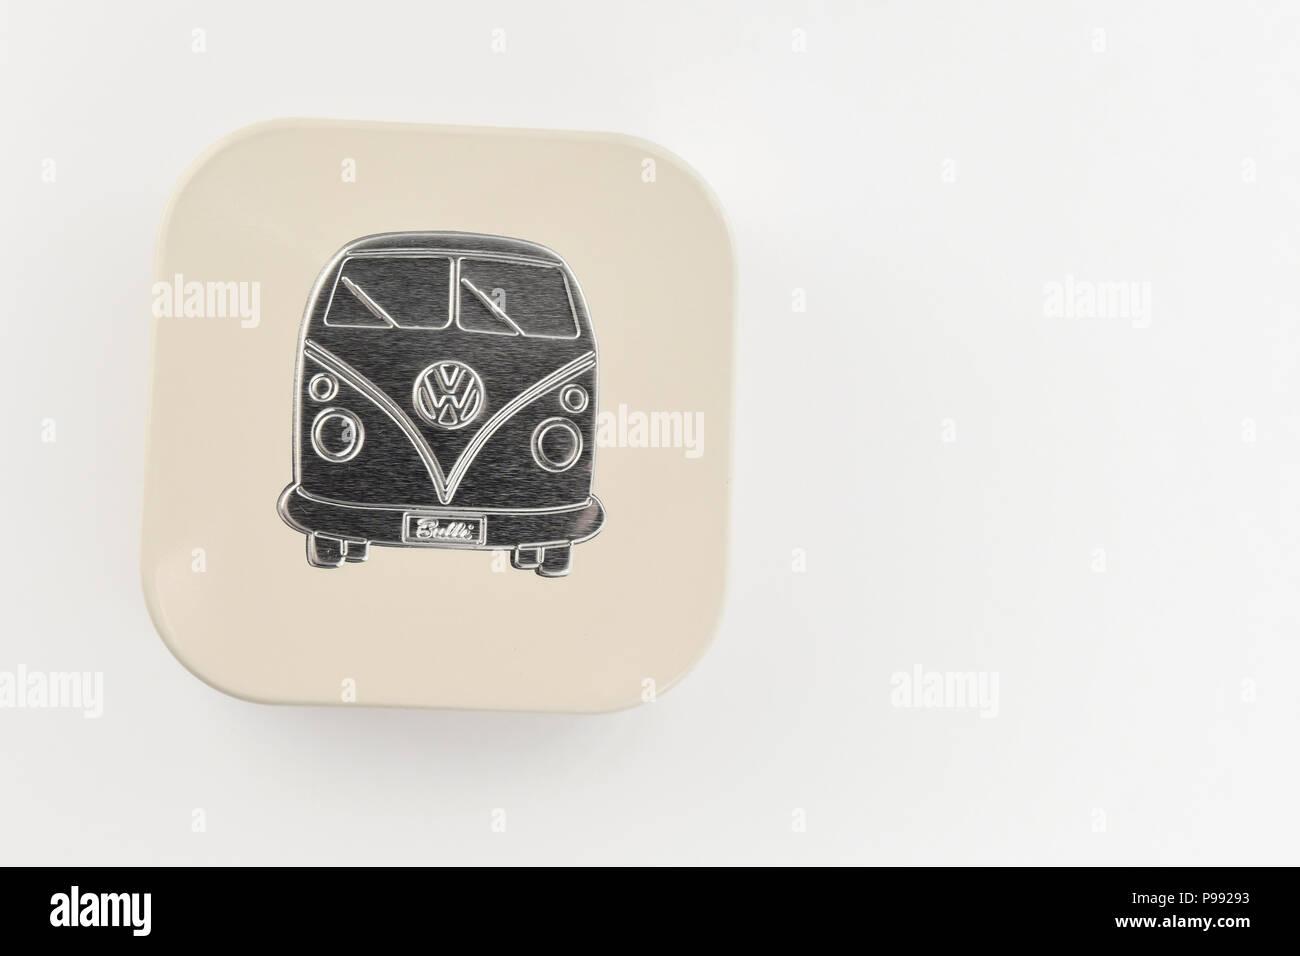 vw bulli split screen campervan on metal tin - vw merchandise Stock Photo